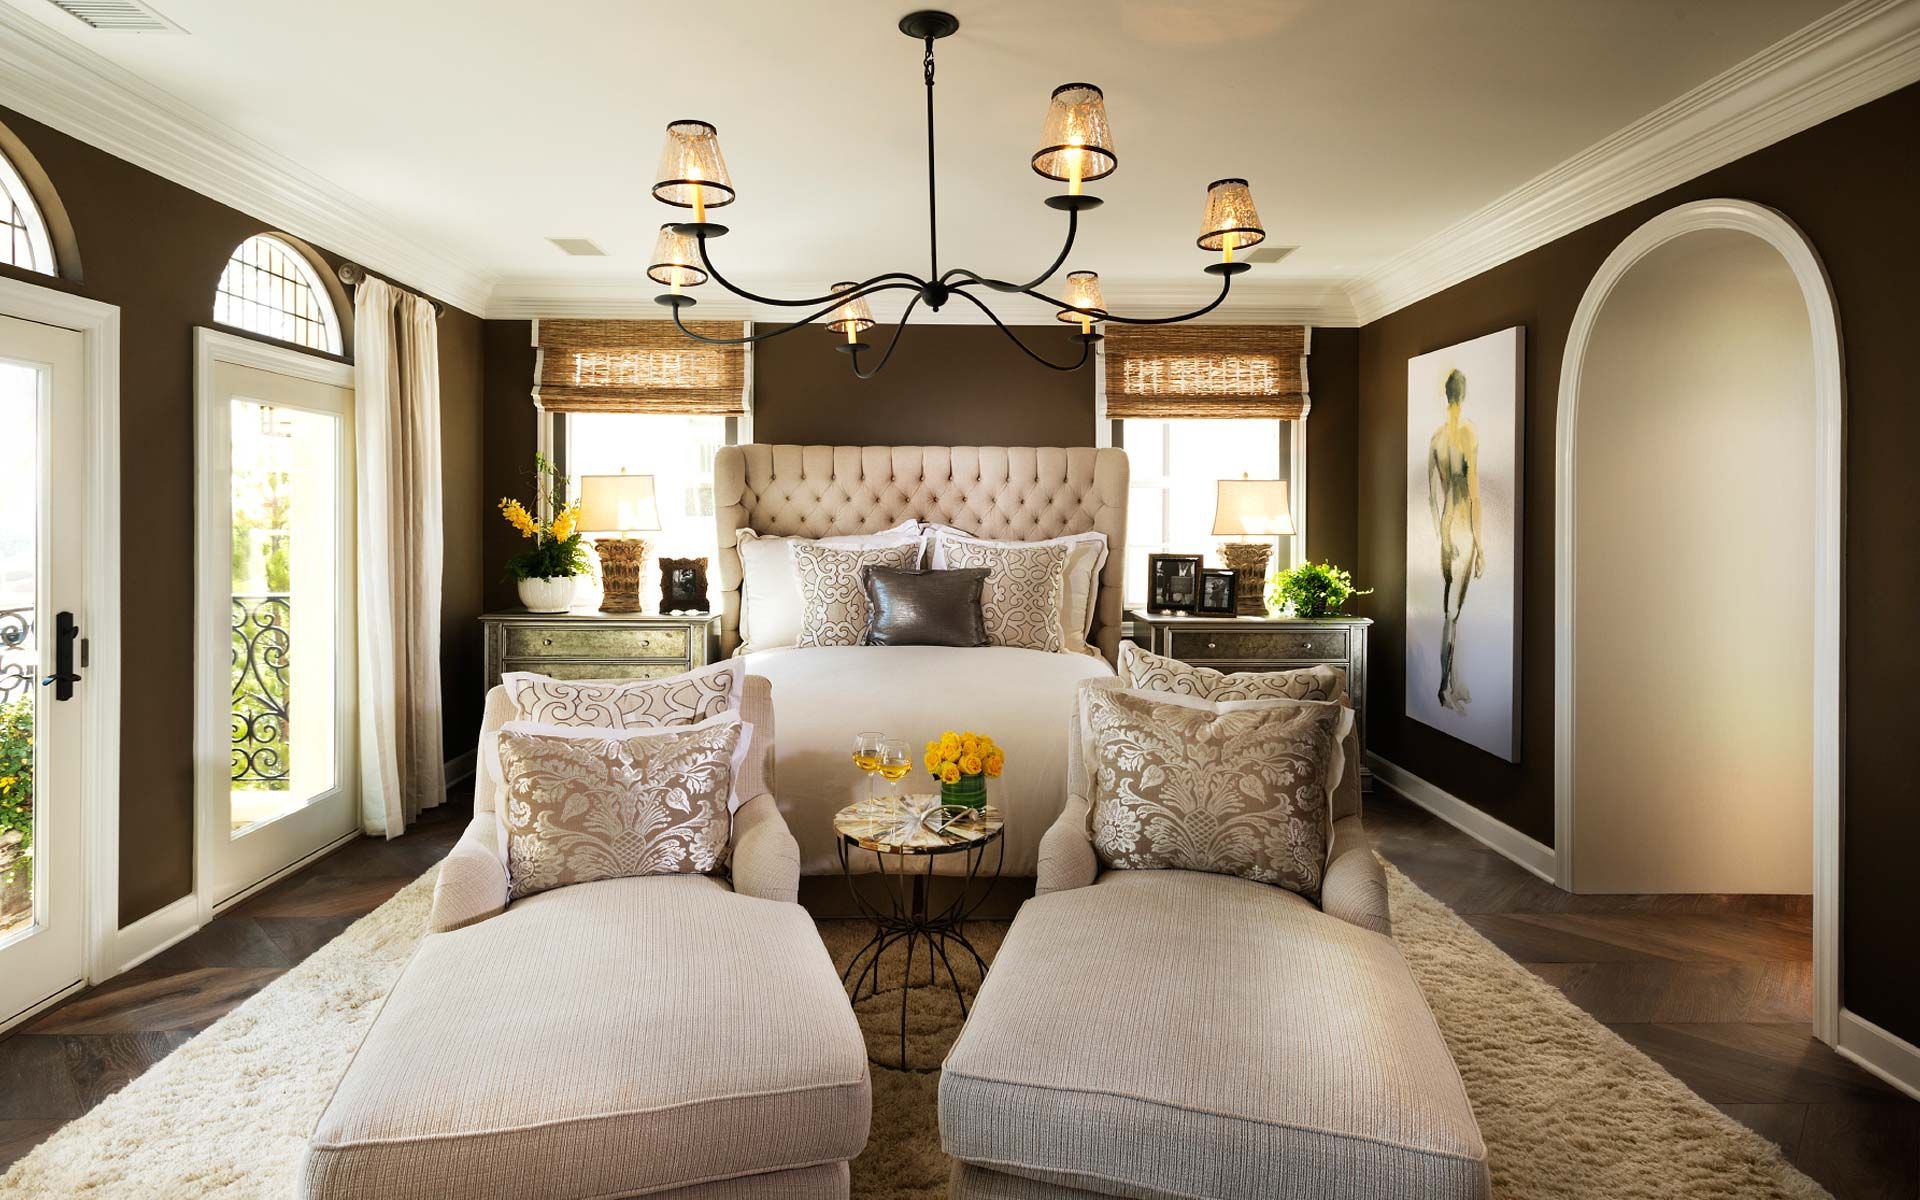 model home interior design - Modern House on Model Bedroom Design  id=71680